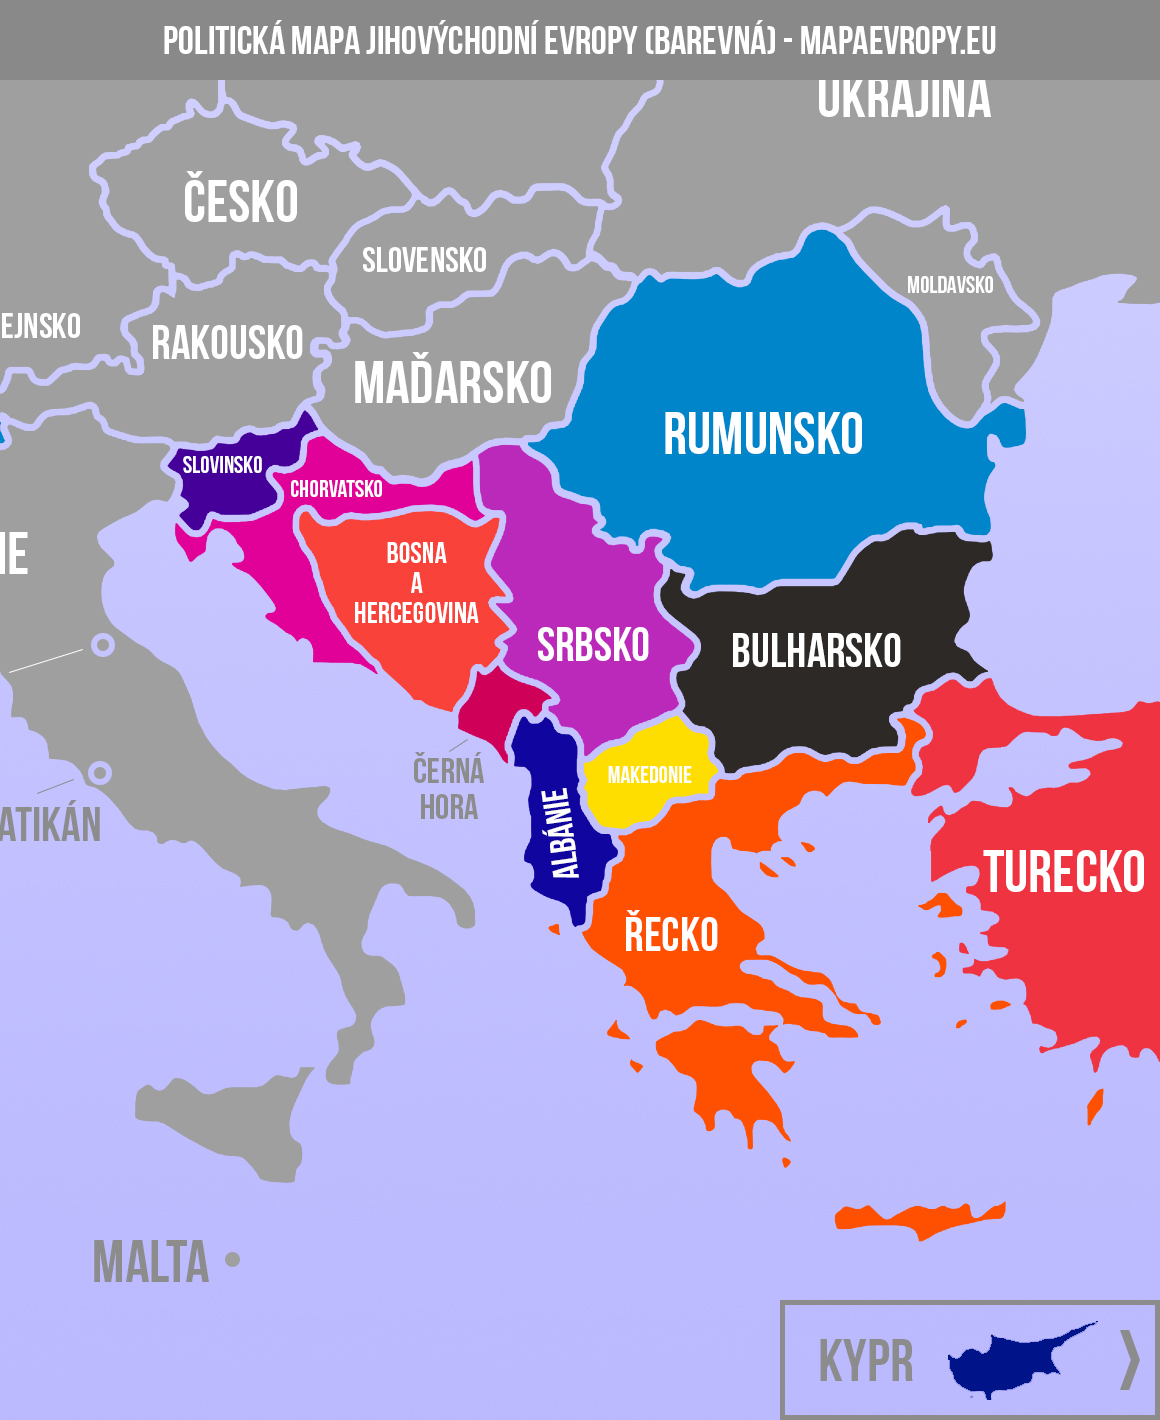 Mapa Jihovychodni Evropy Politicka A Slepa Mapaevropy Eu